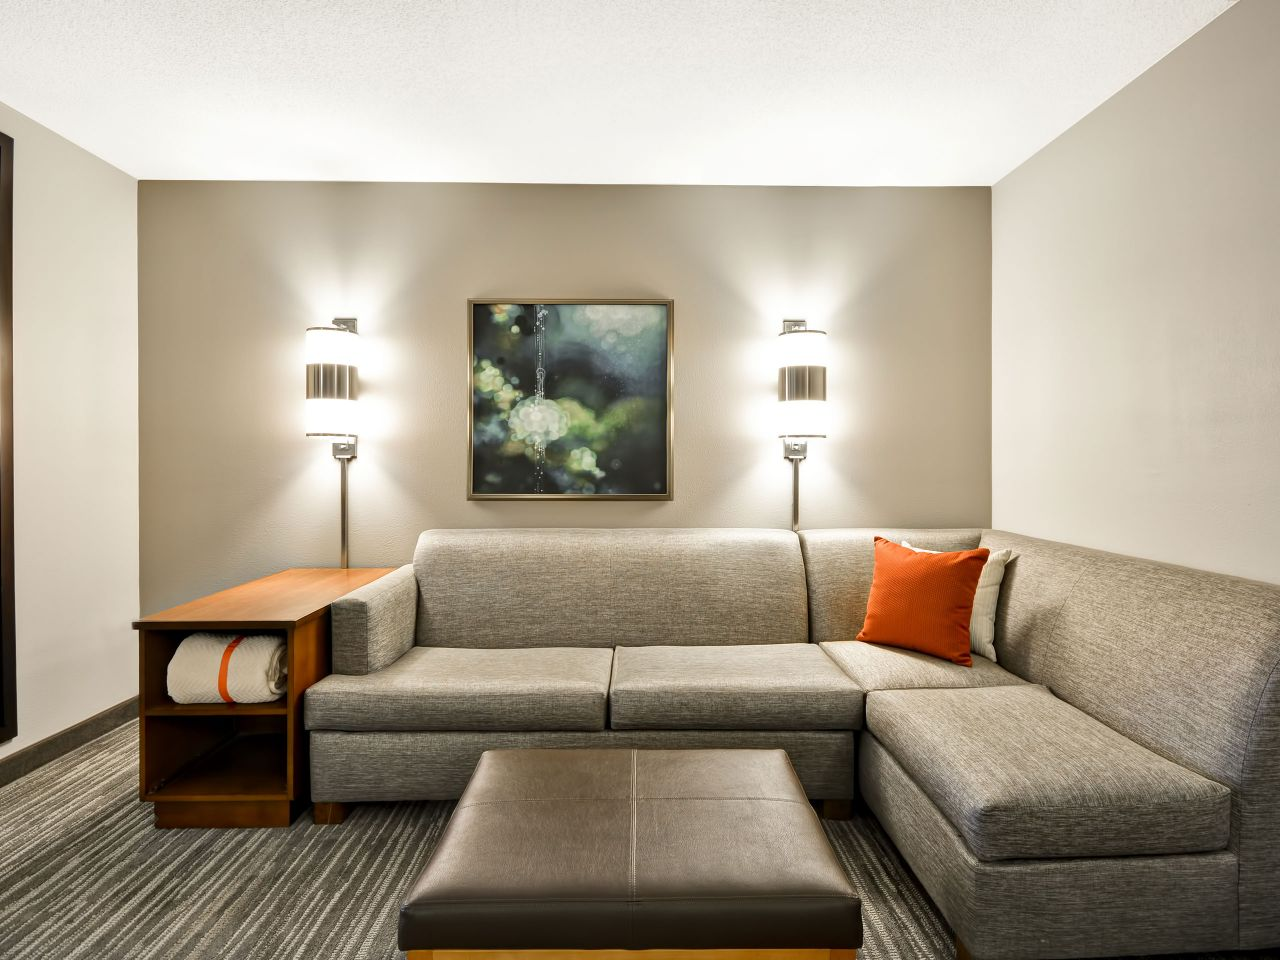 Beau Enjoy Spacious And Comfortable Rooms At Hyatt.